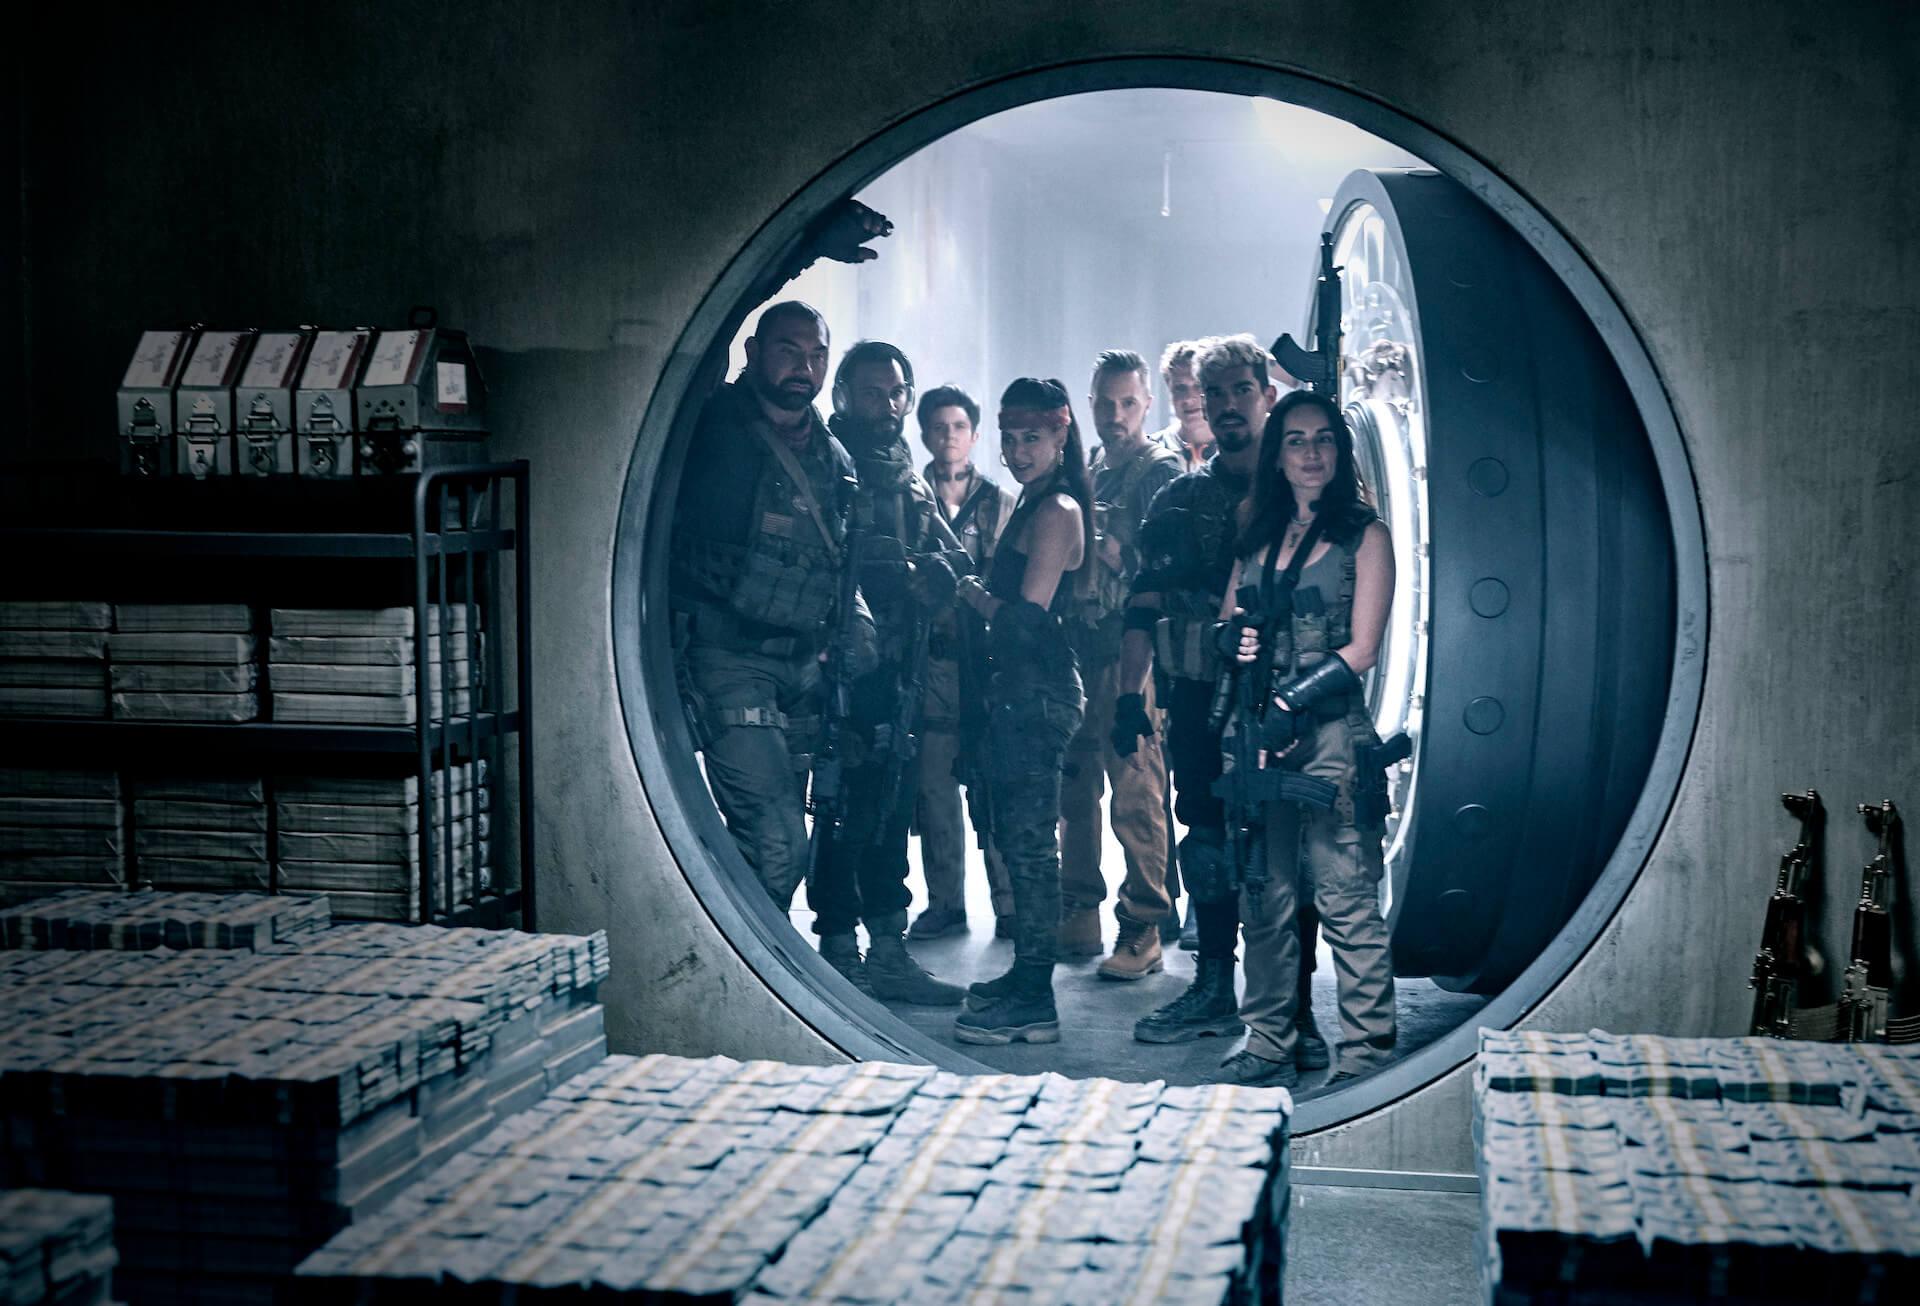 NetflixにMCU『スパイダーマン』が登場!『ファースト・マン』『マスカレード・ホテル』など5月のラインナップが一挙解禁 art210423_netflix_may_12